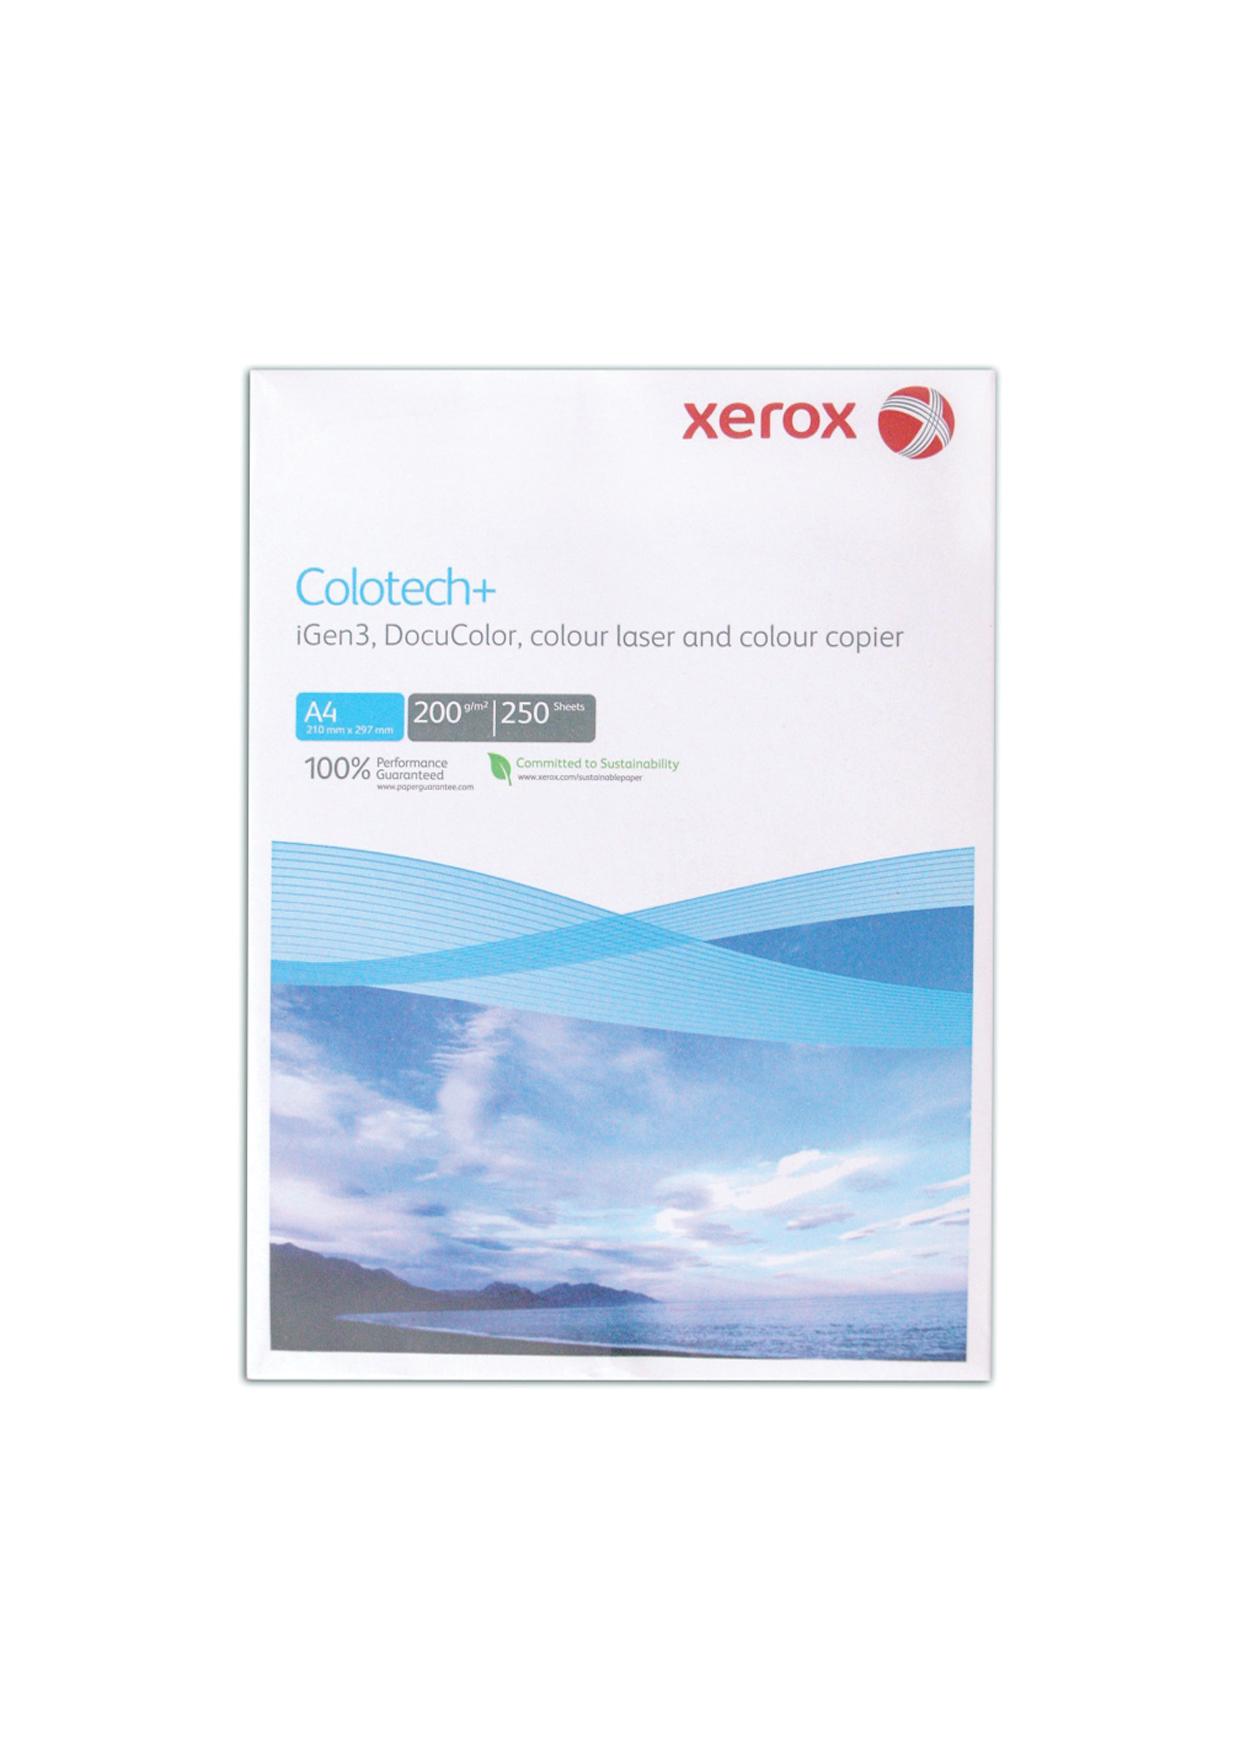 Копирна хартия Xerox Colotech+ А3, 250 листа 250g/m2  бял